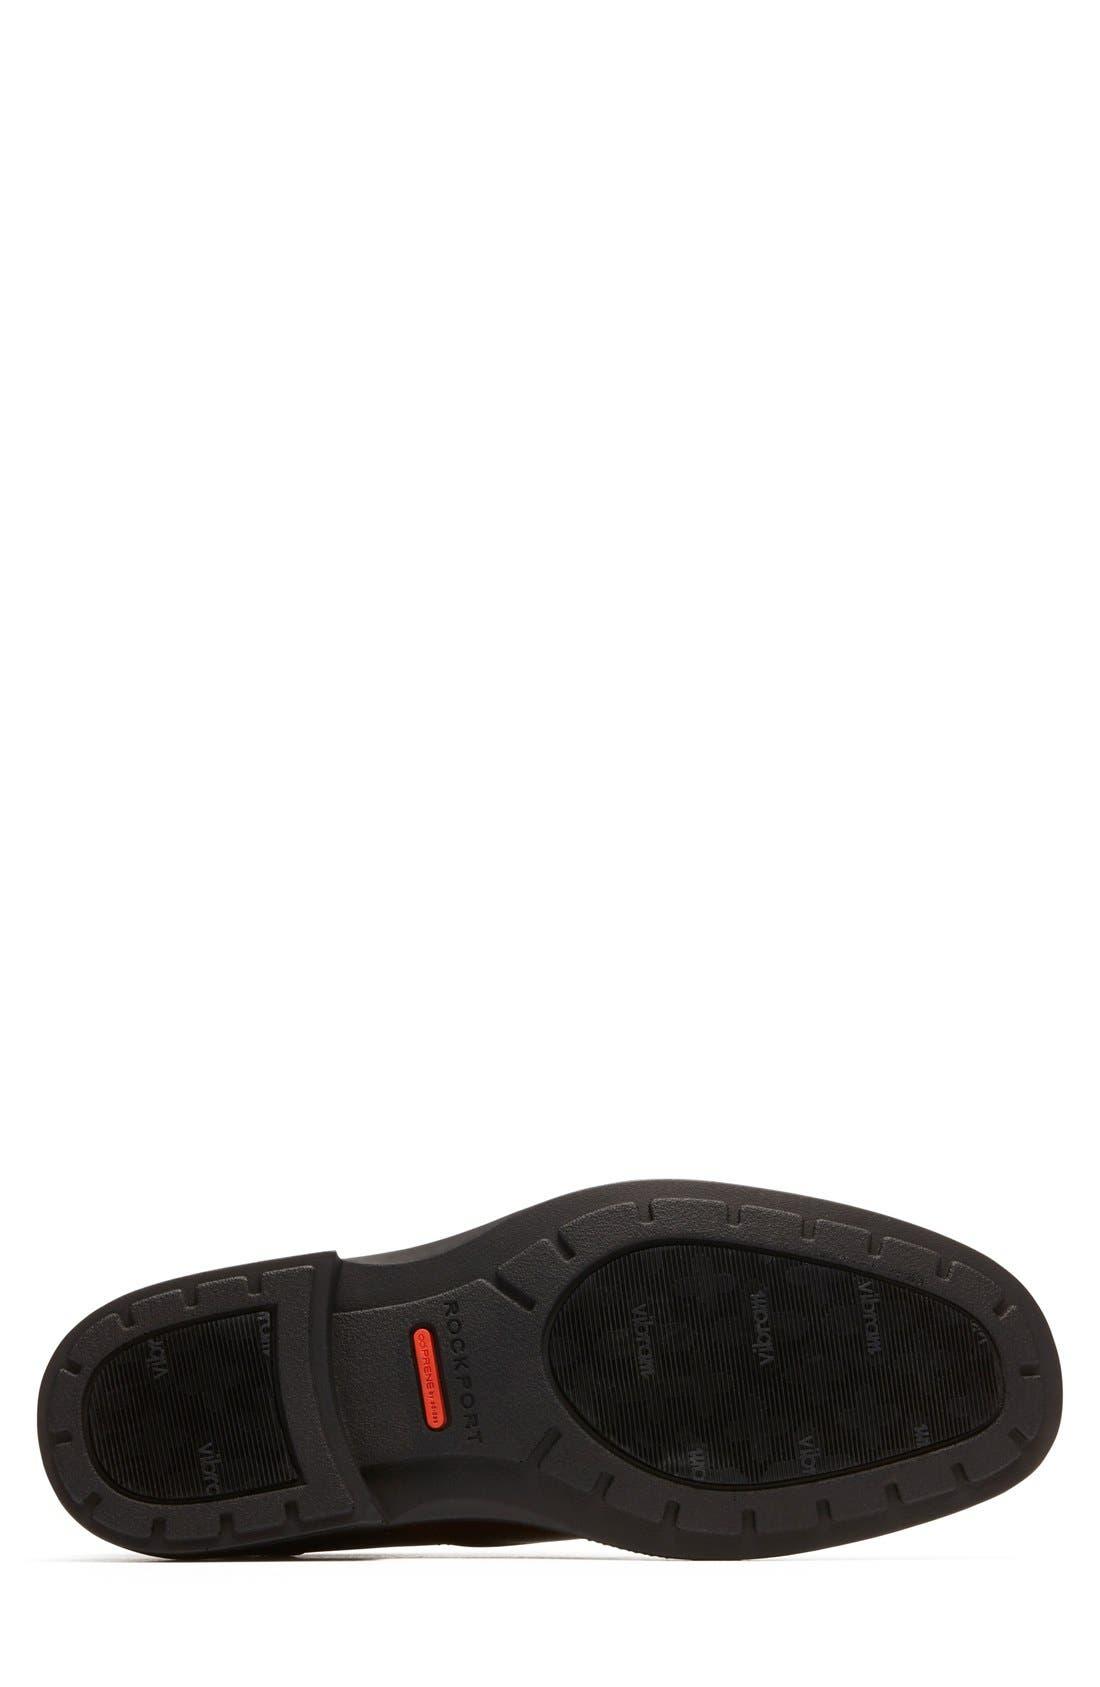 DresSports Luxe Bike Toe Slip-On,                             Alternate thumbnail 4, color,                             NEW BROWN